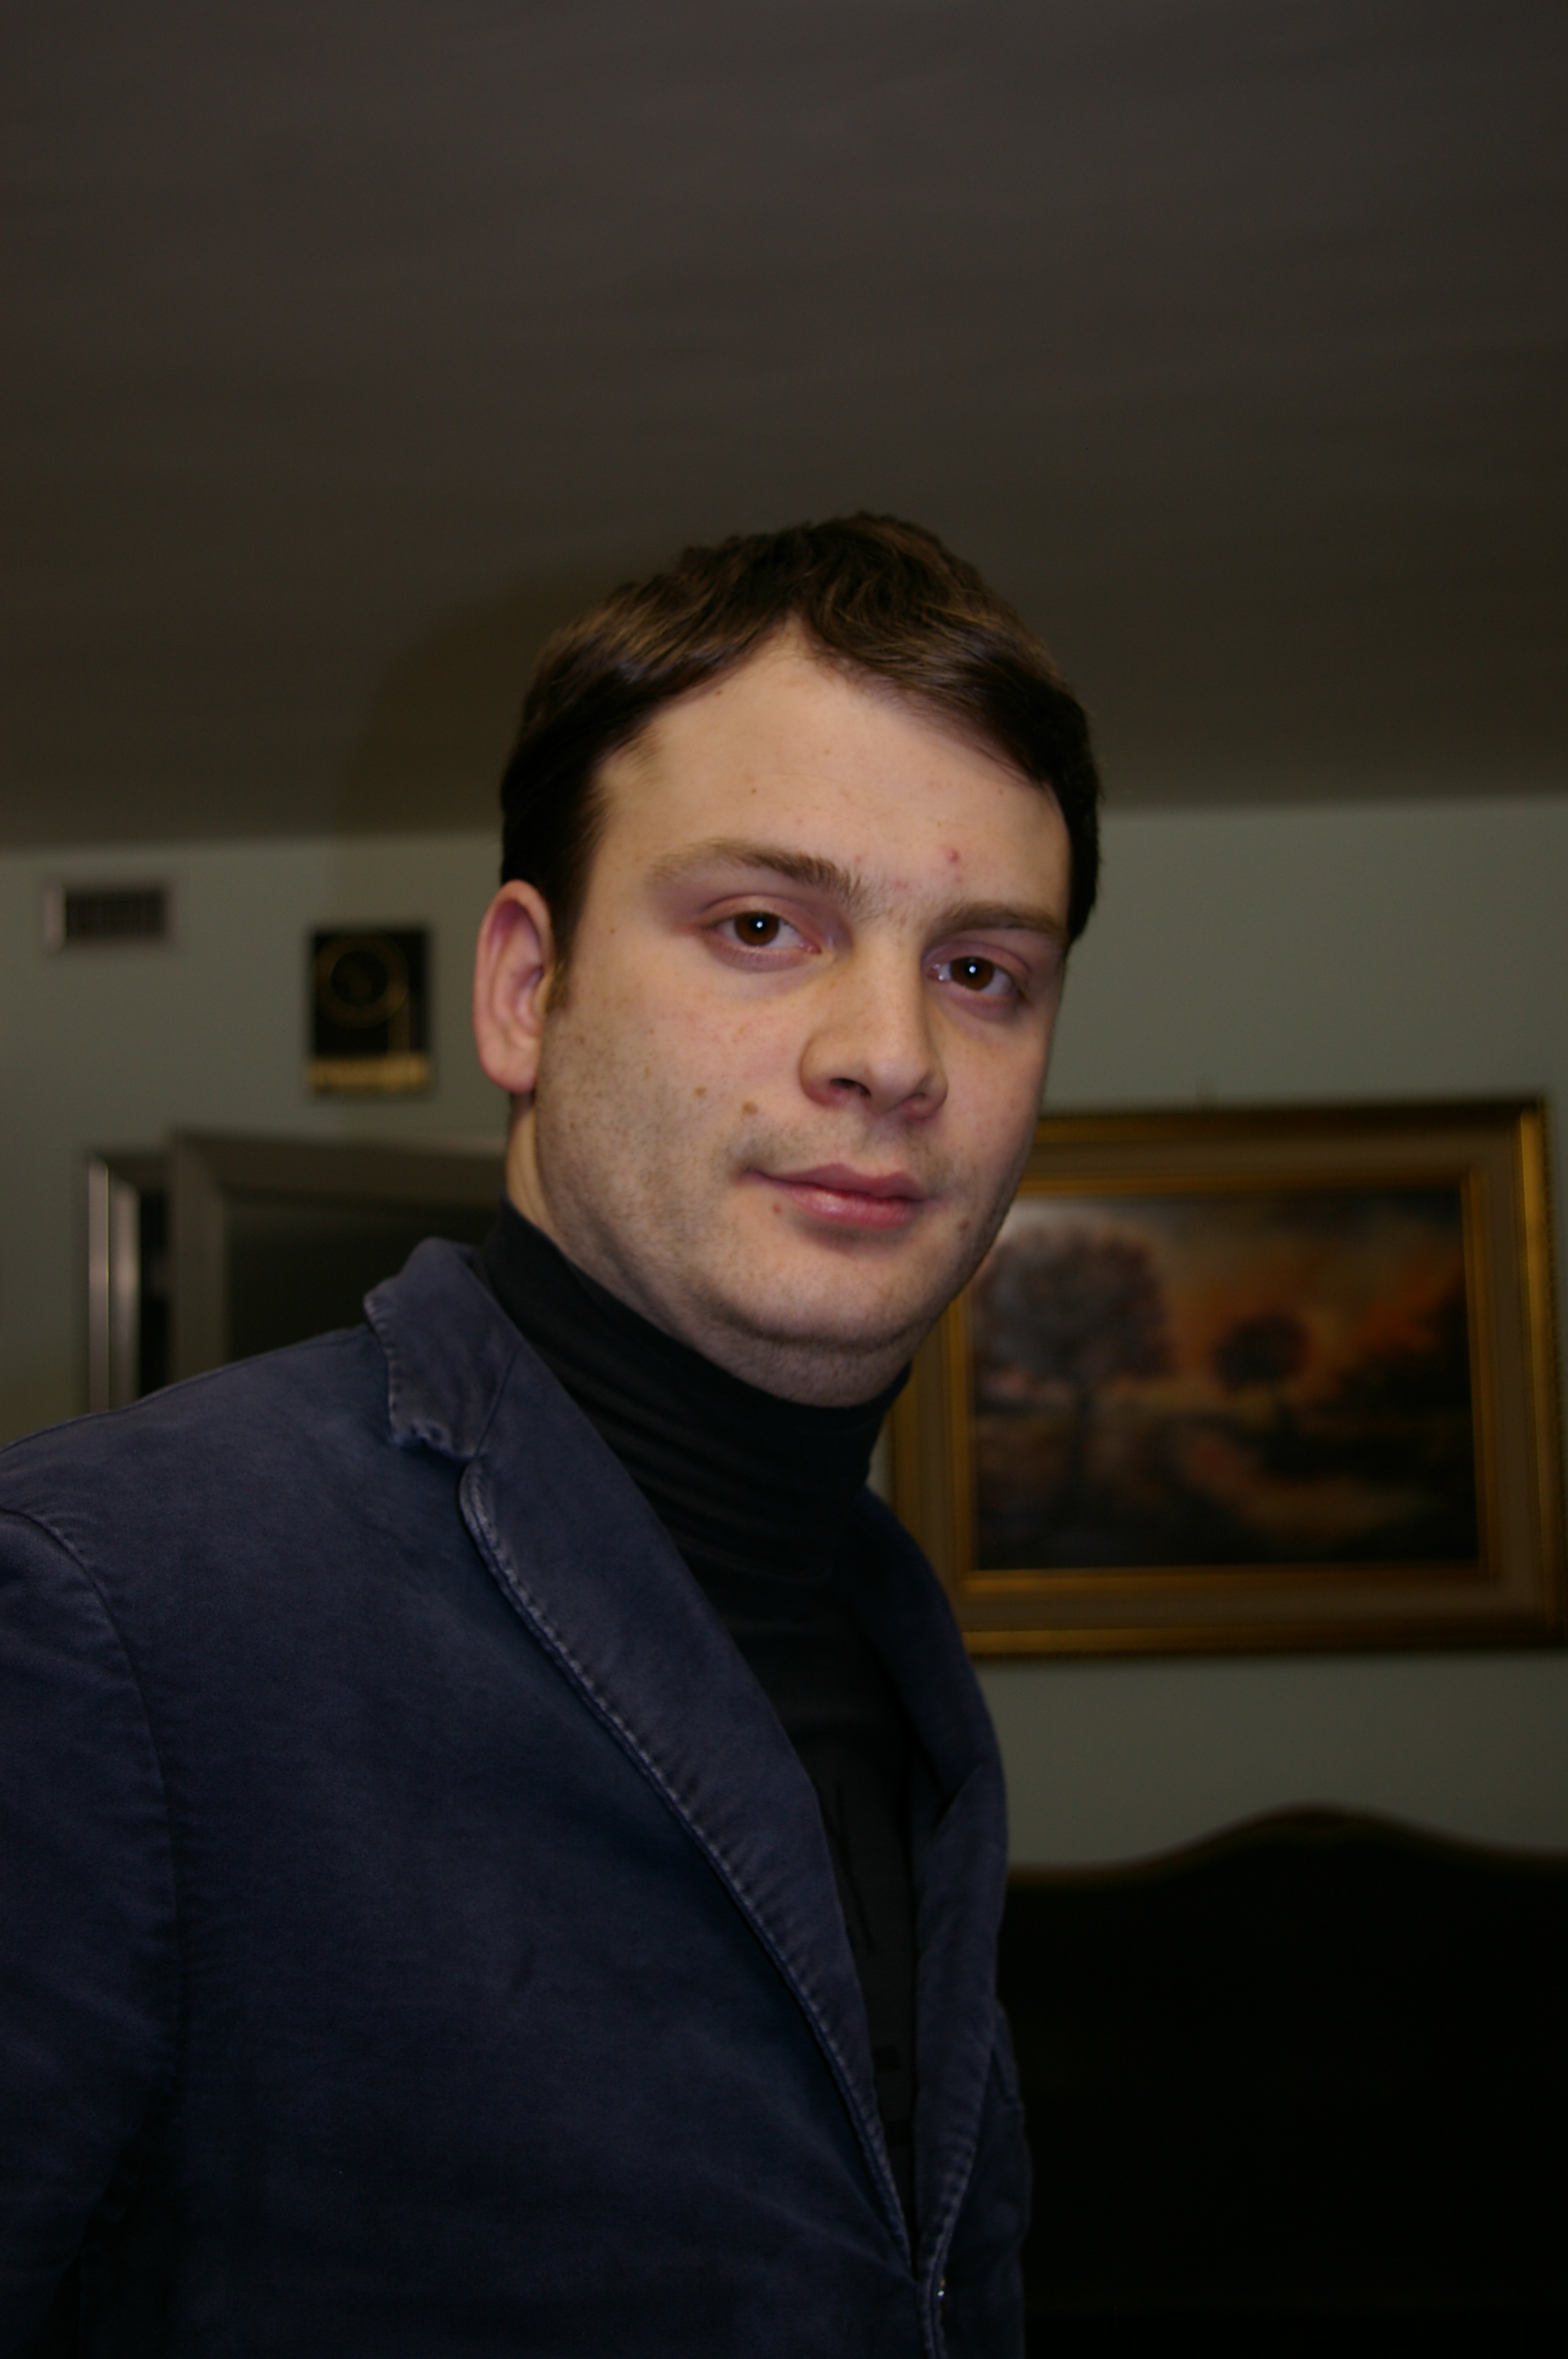 048-Diego-Iovane---Nocera-Inferiore-SA.jpg